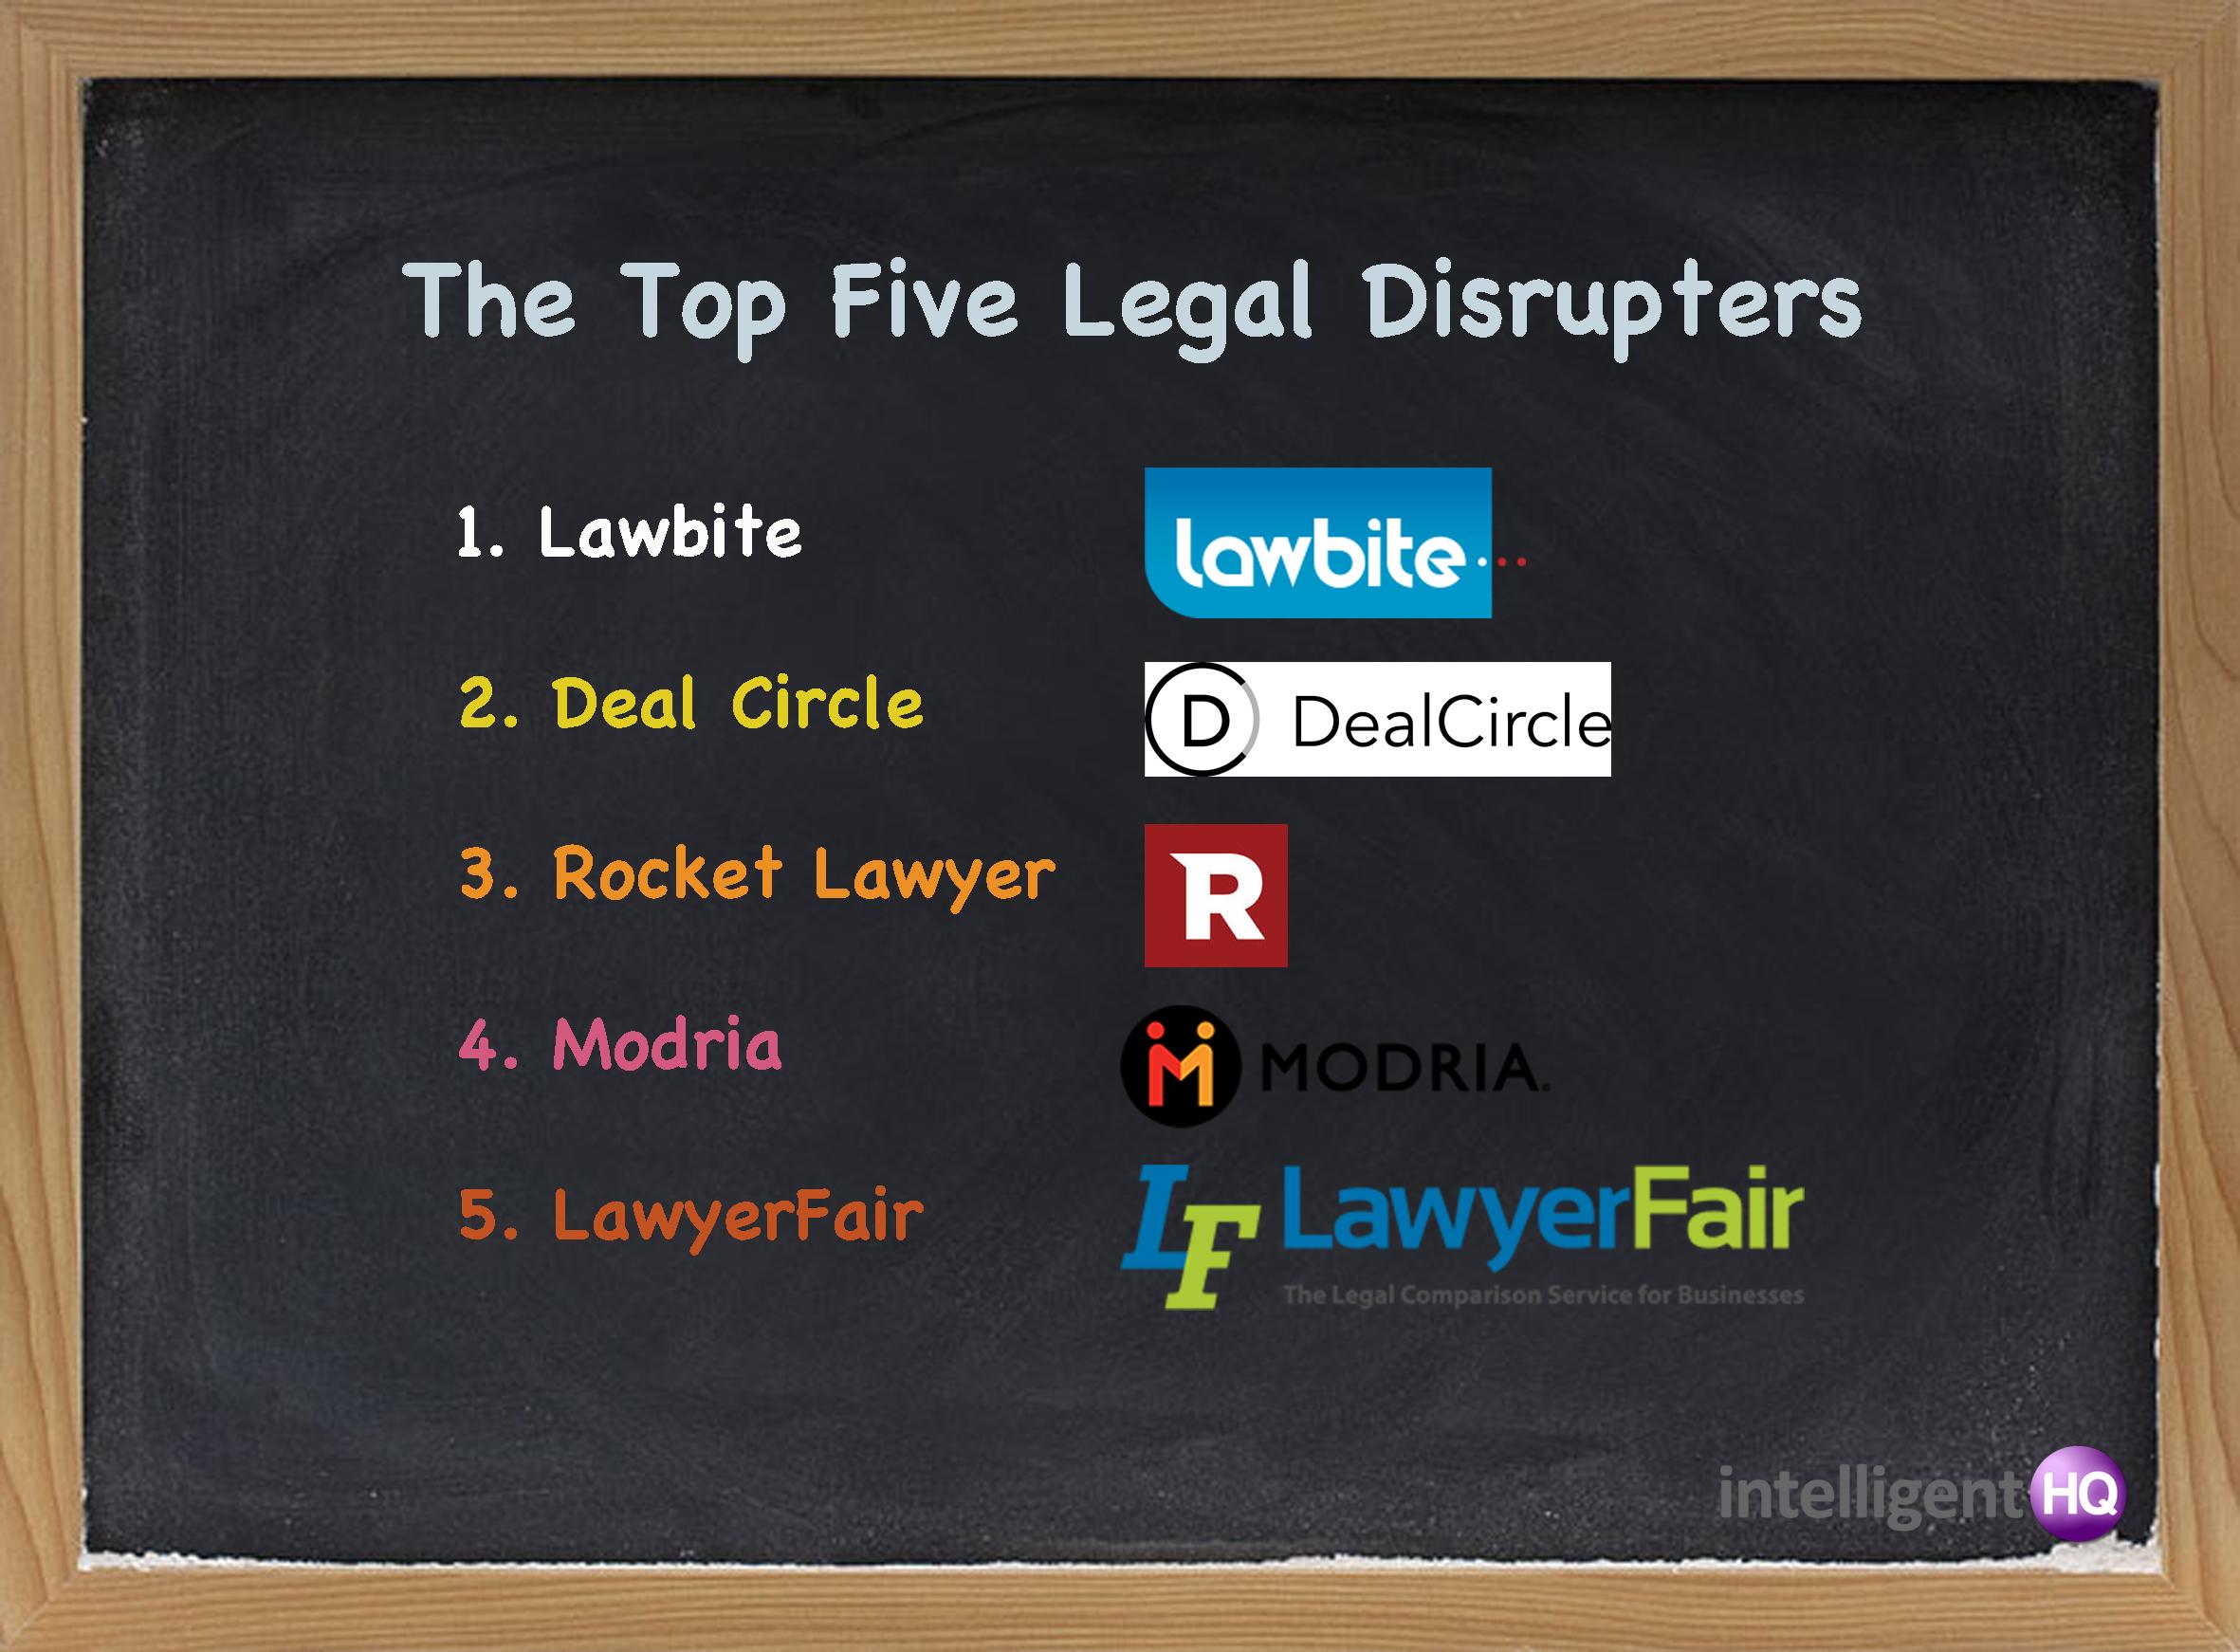 Top Five Legal Disrupters. Intelligenthq